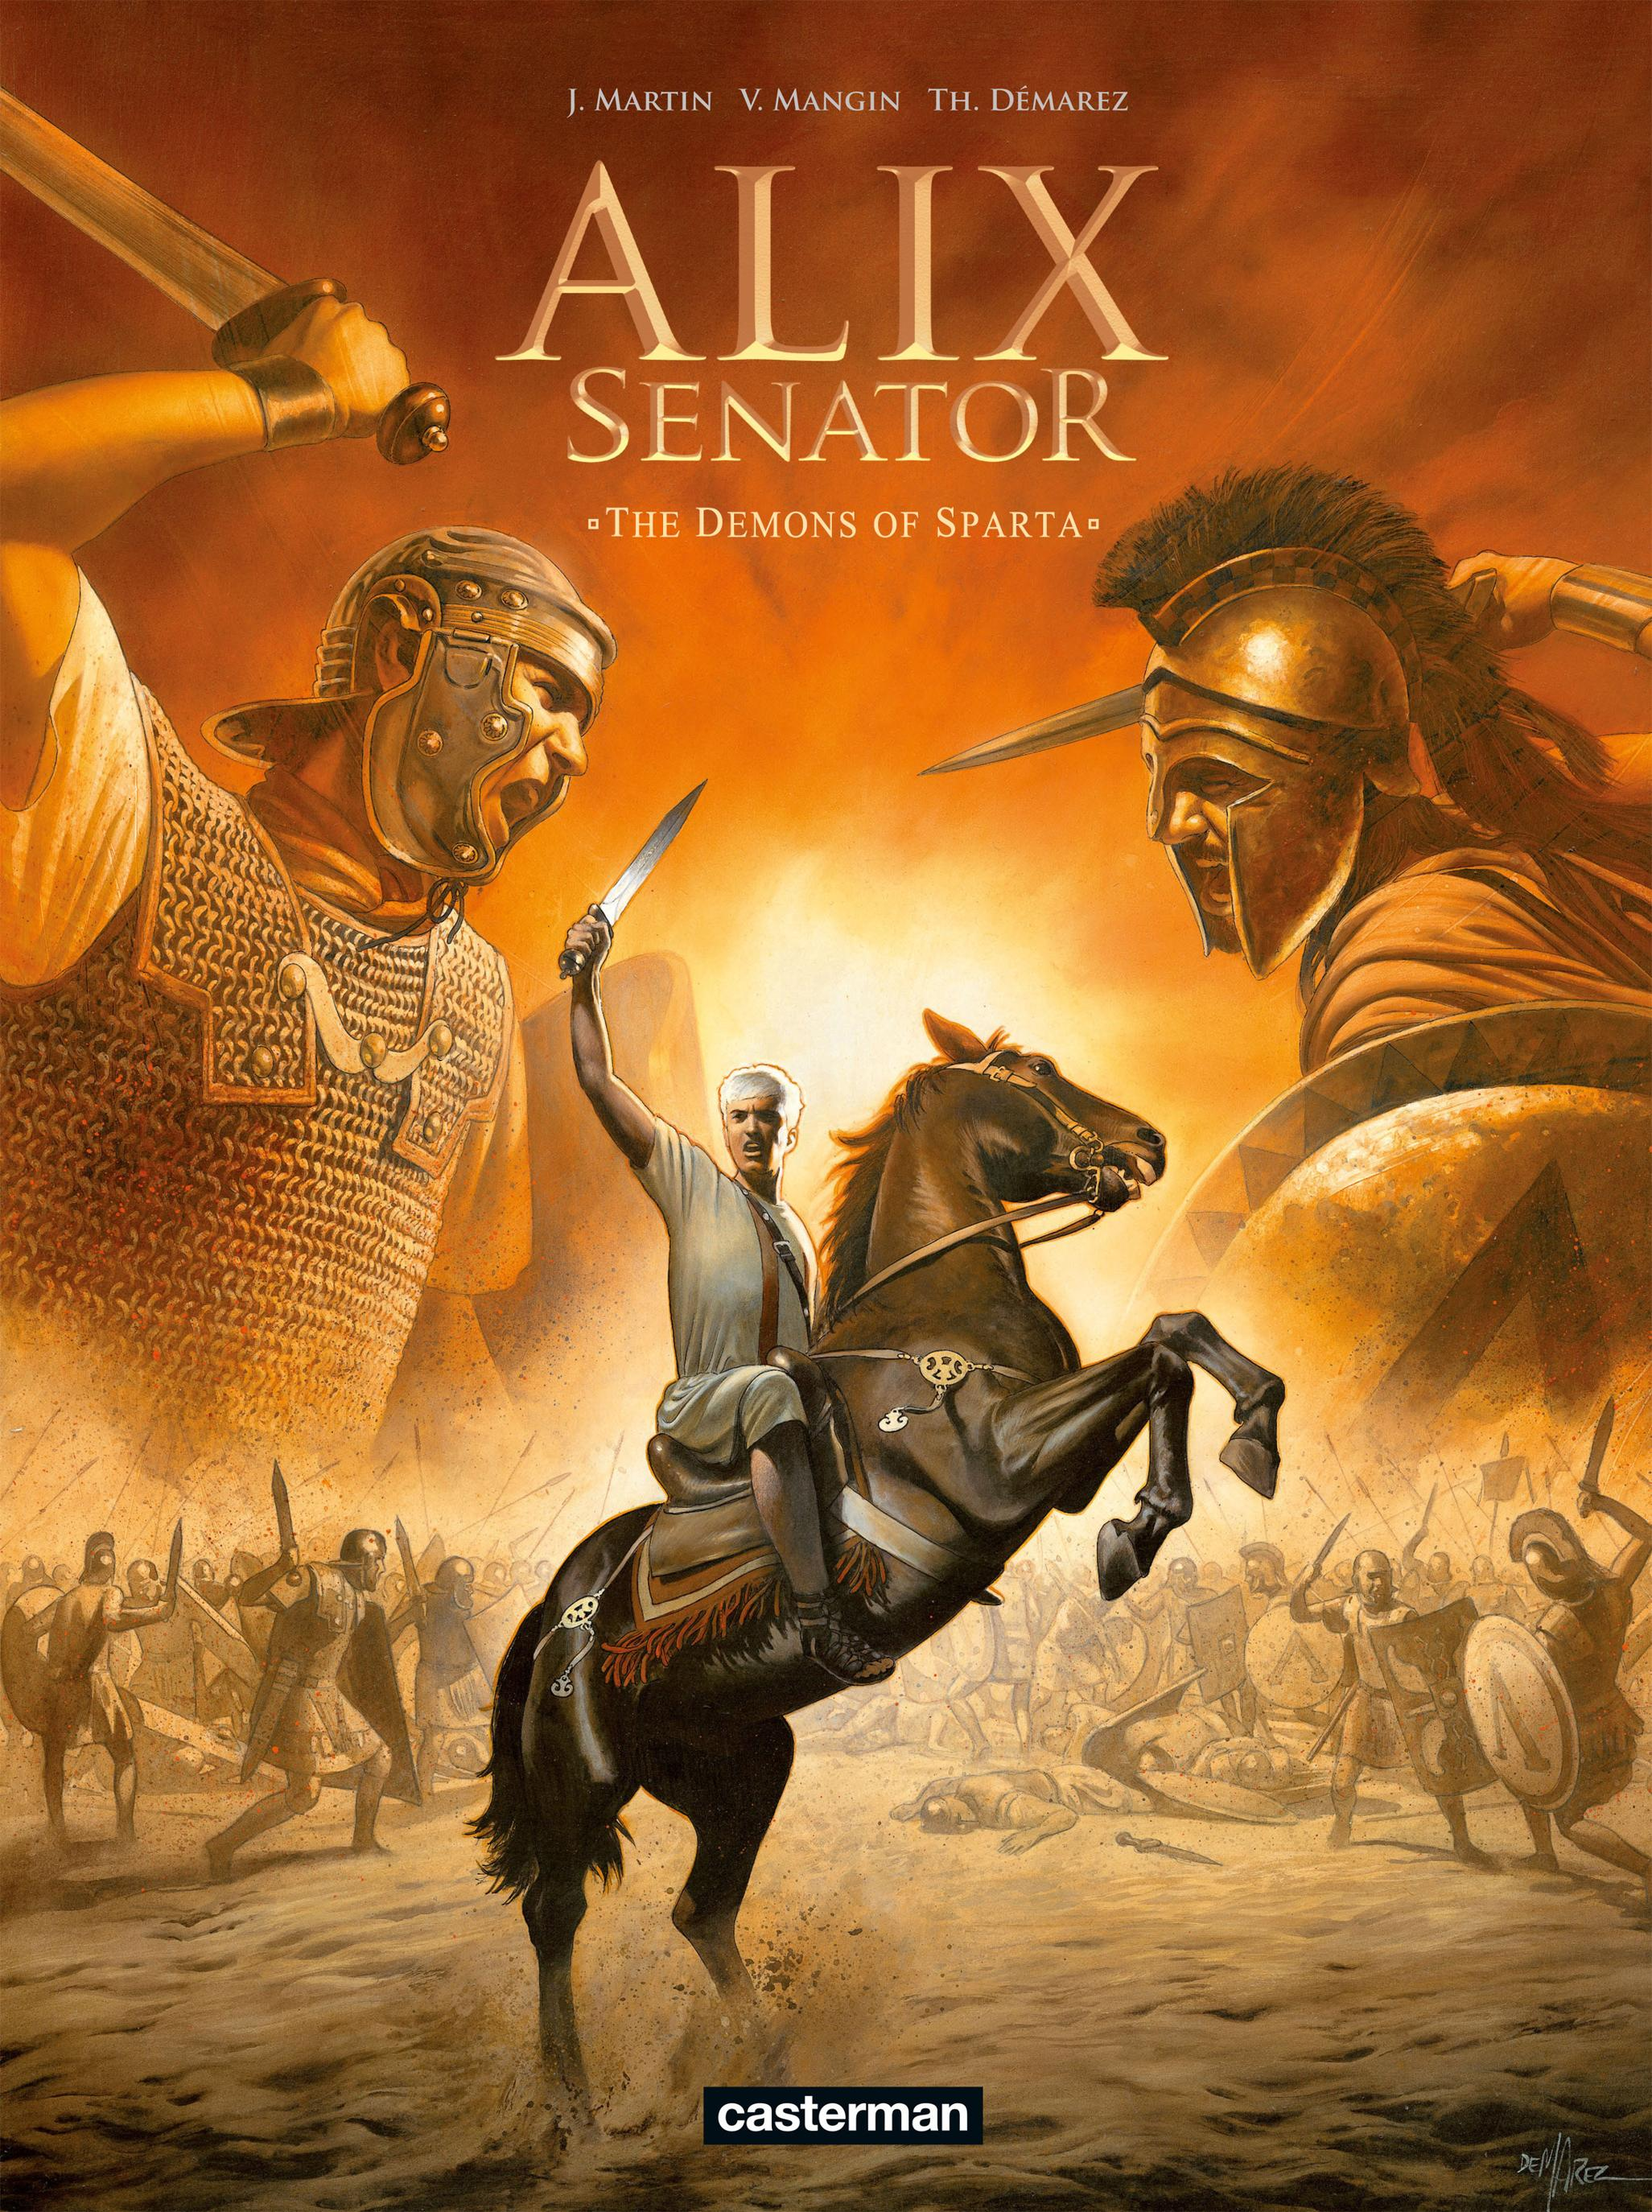 Alix Senator 04-The Demons of Sparta 2015 Scanlation phillywilly